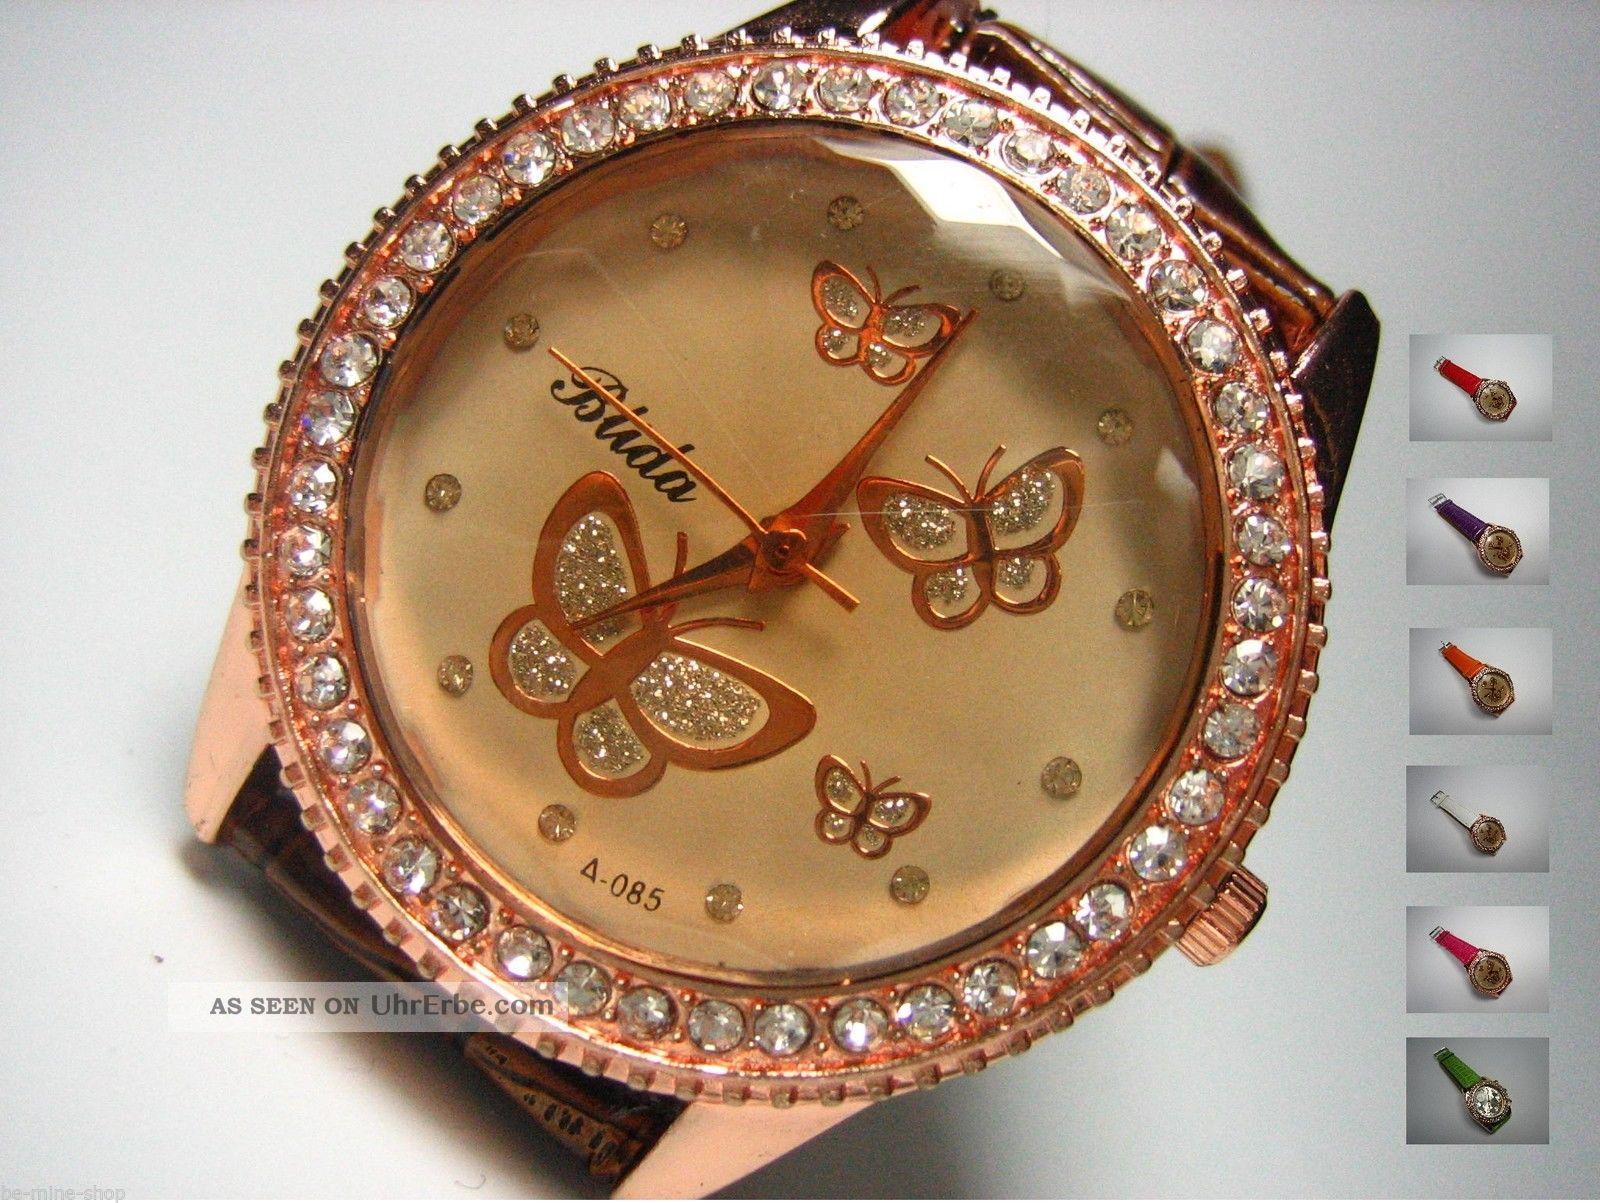 Uhr Damen Strass Rosé - Gold Schmetterling Butterfly Kroko Style Armbanduhren Bild